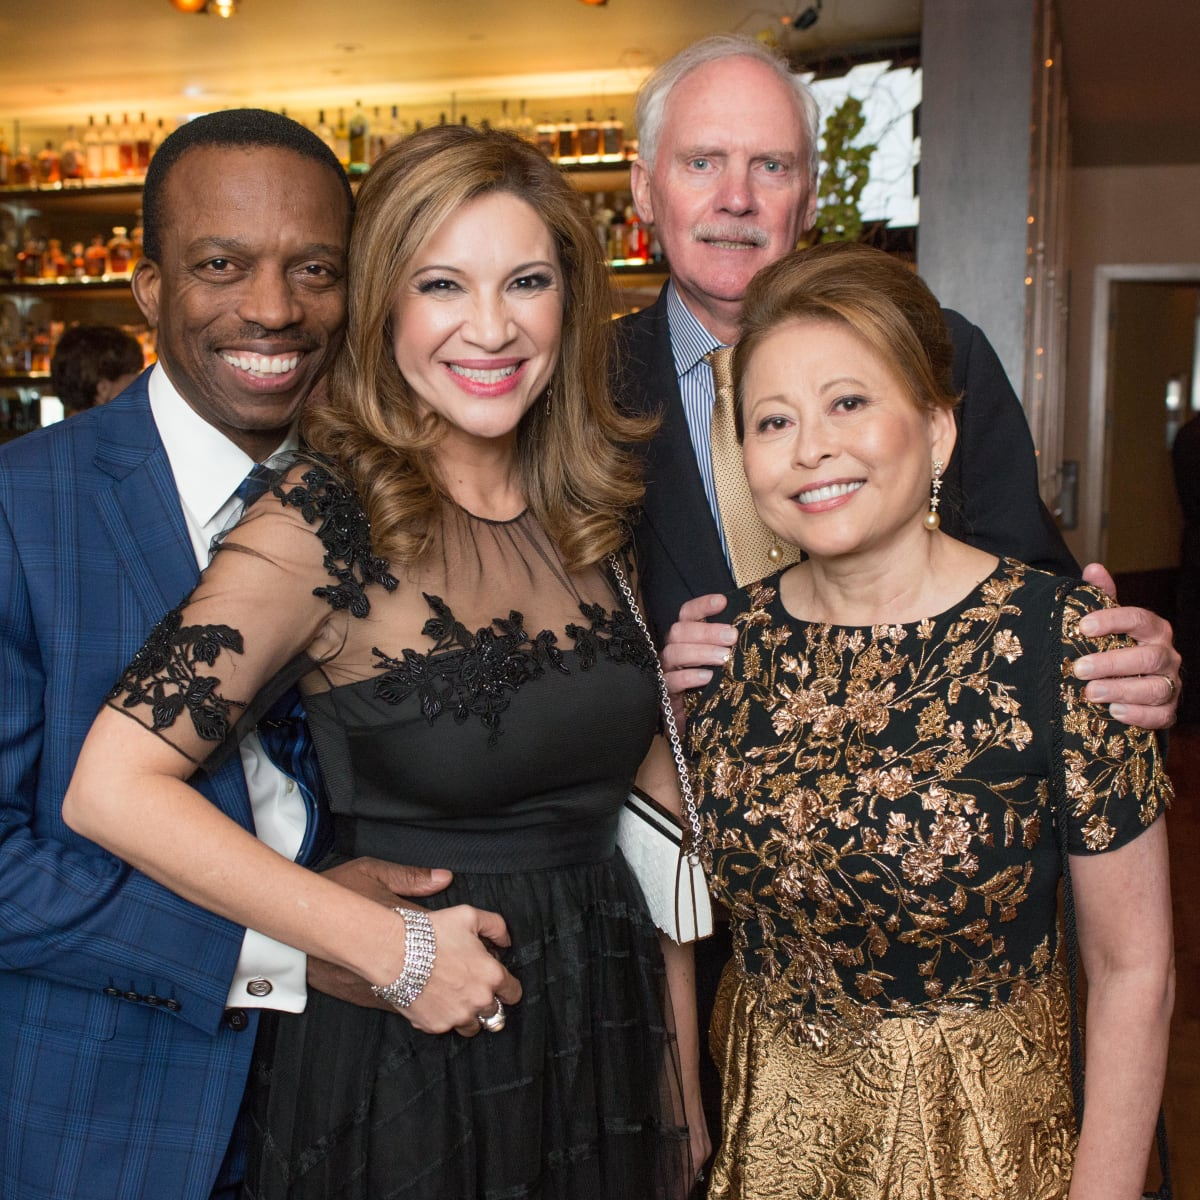 News, Shelby, Tony's 50th, Nov. 2015, Alistair Blair, Alex Blair, Edward Ziegler, Rini Ziegler